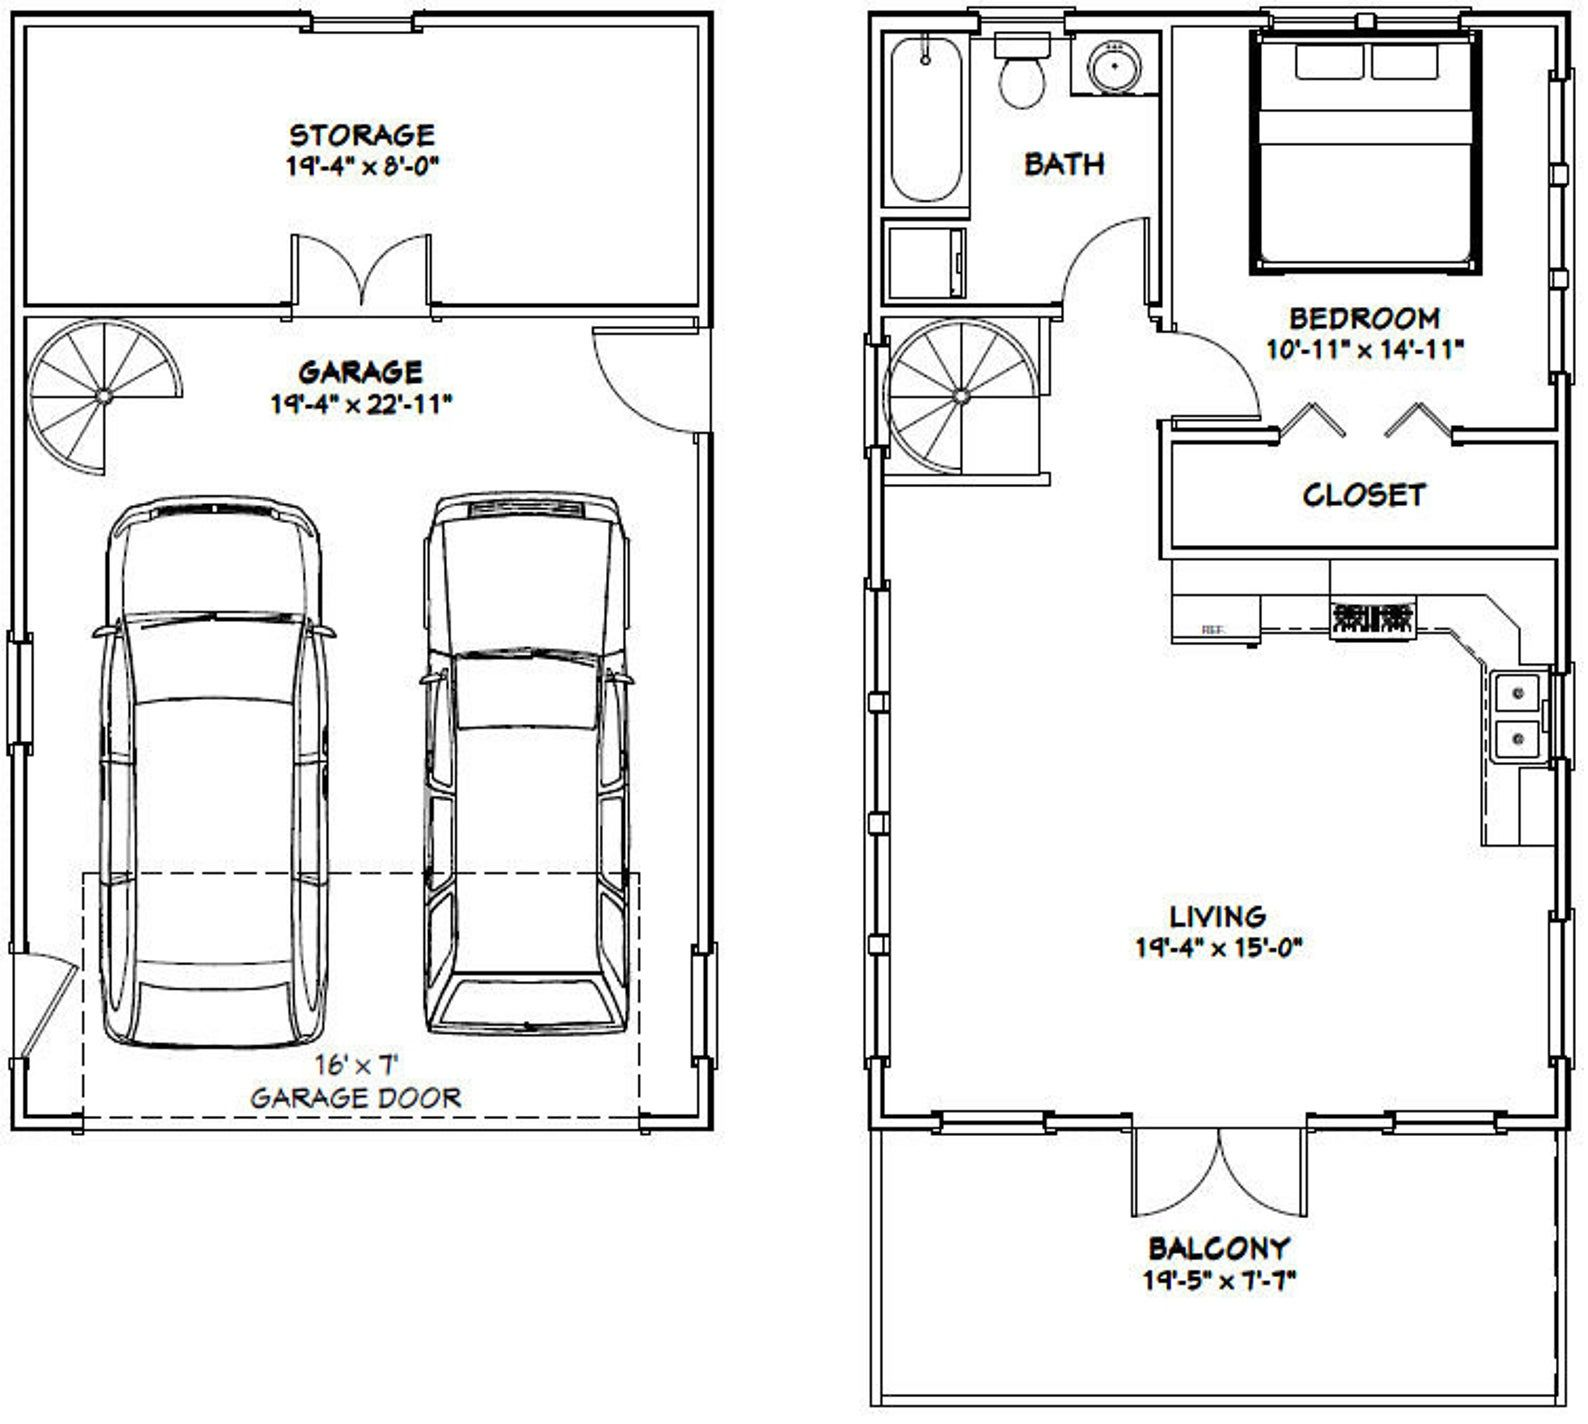 20x32 House 1 Bedroom 1 Bath 785 sq ft PDF Floor